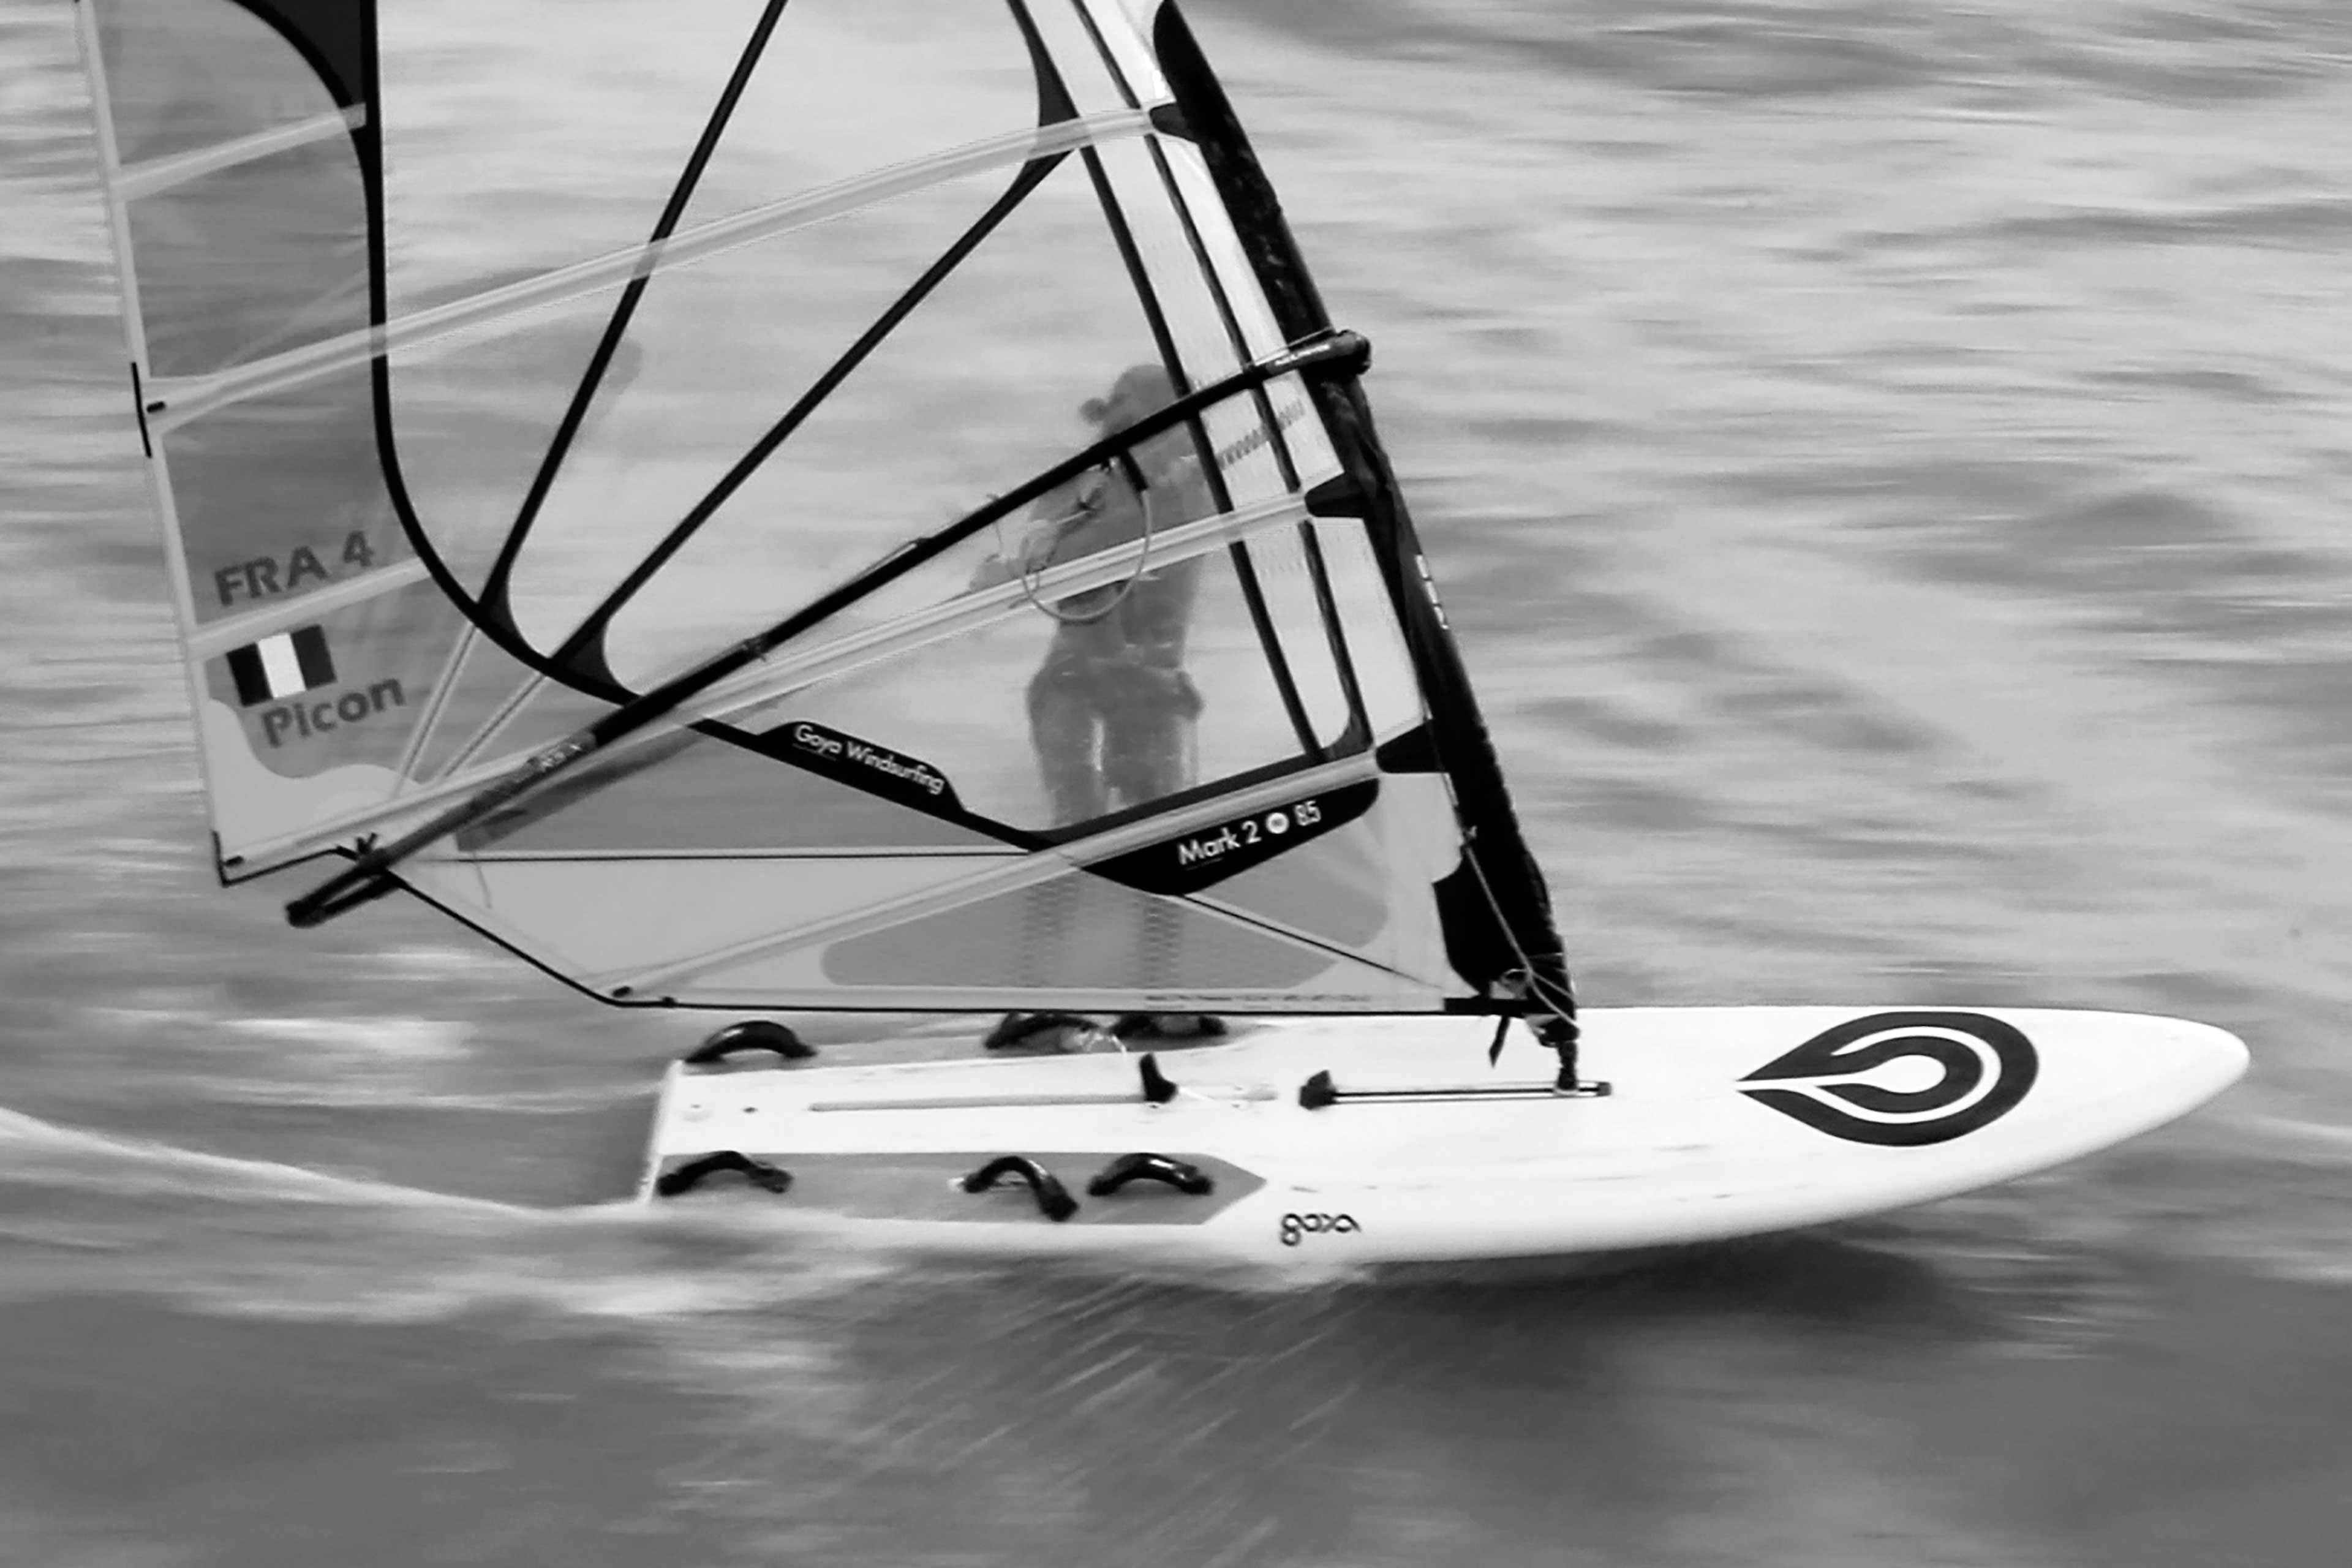 Goya Windsurfing - Boards - Regatta Pro